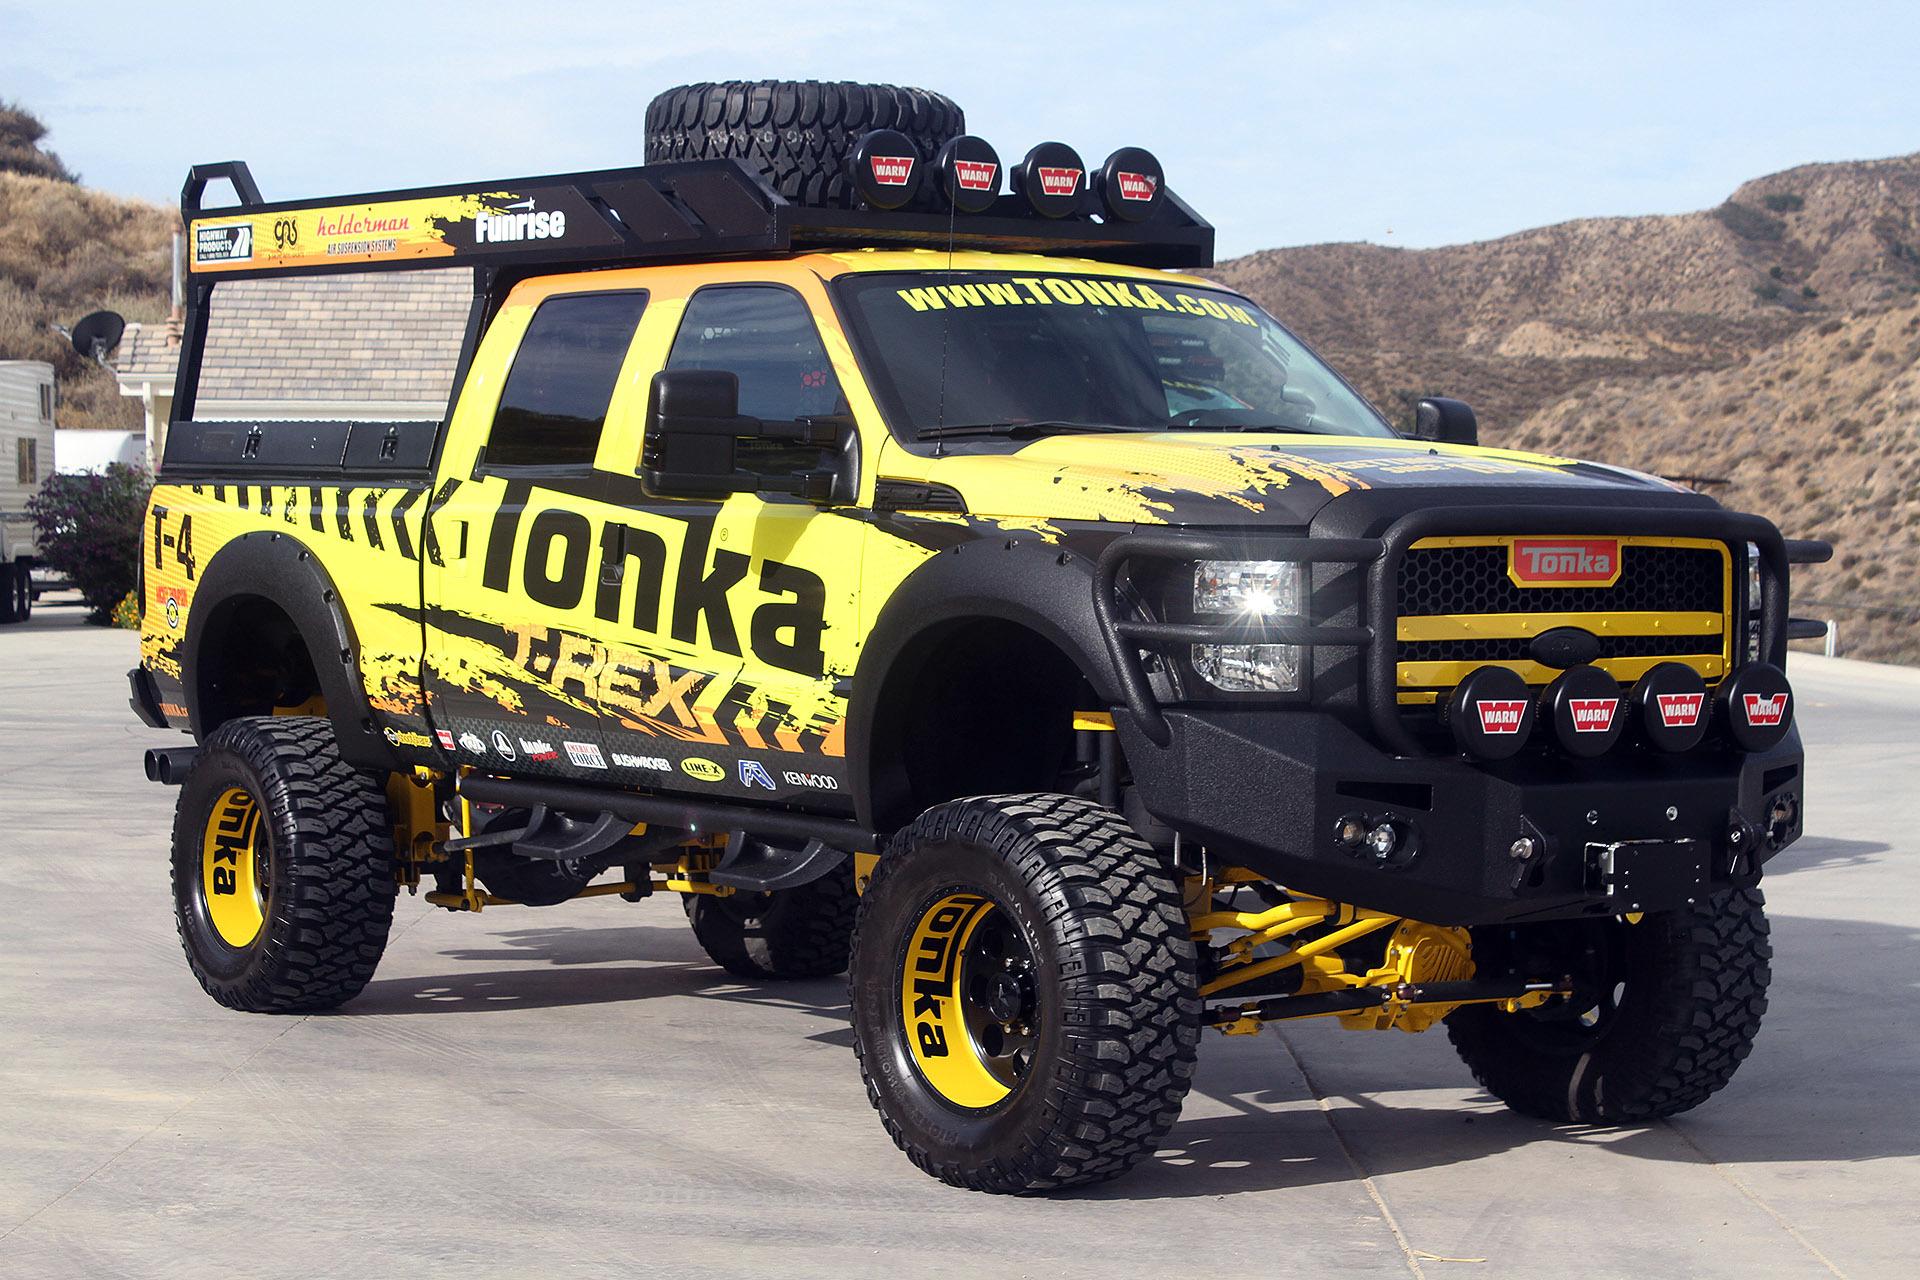 T Rex Tundra Overlander Trucks By Tonka 8